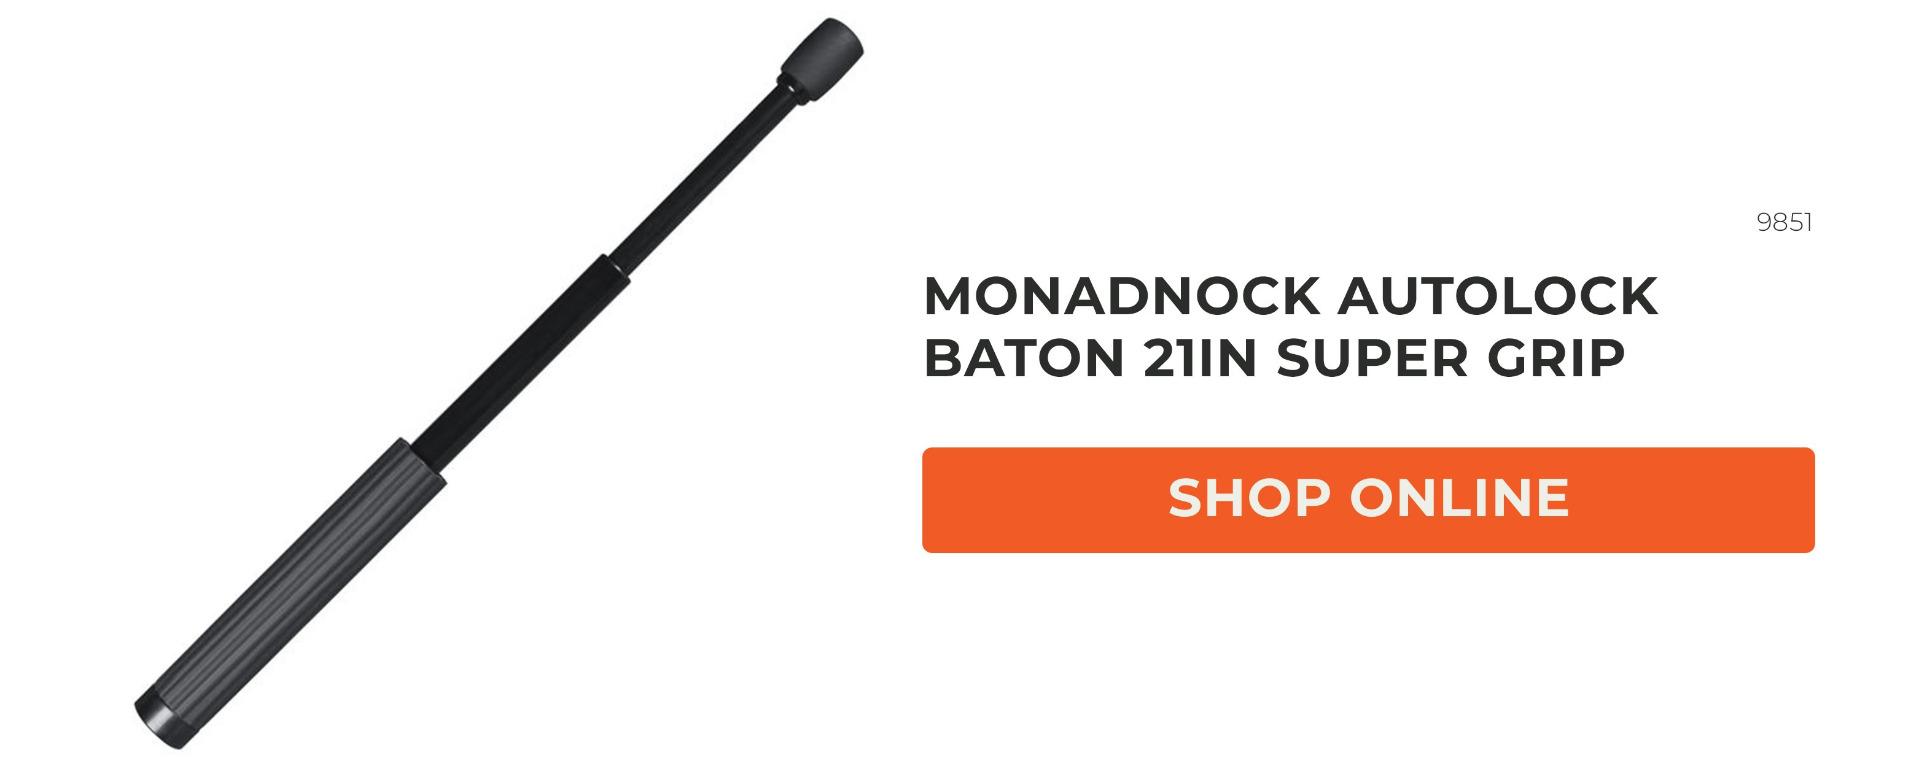 SAFARI OUTDOOR MONADNOCK AUTOLOCK BATON 21IN SUPER GRIP